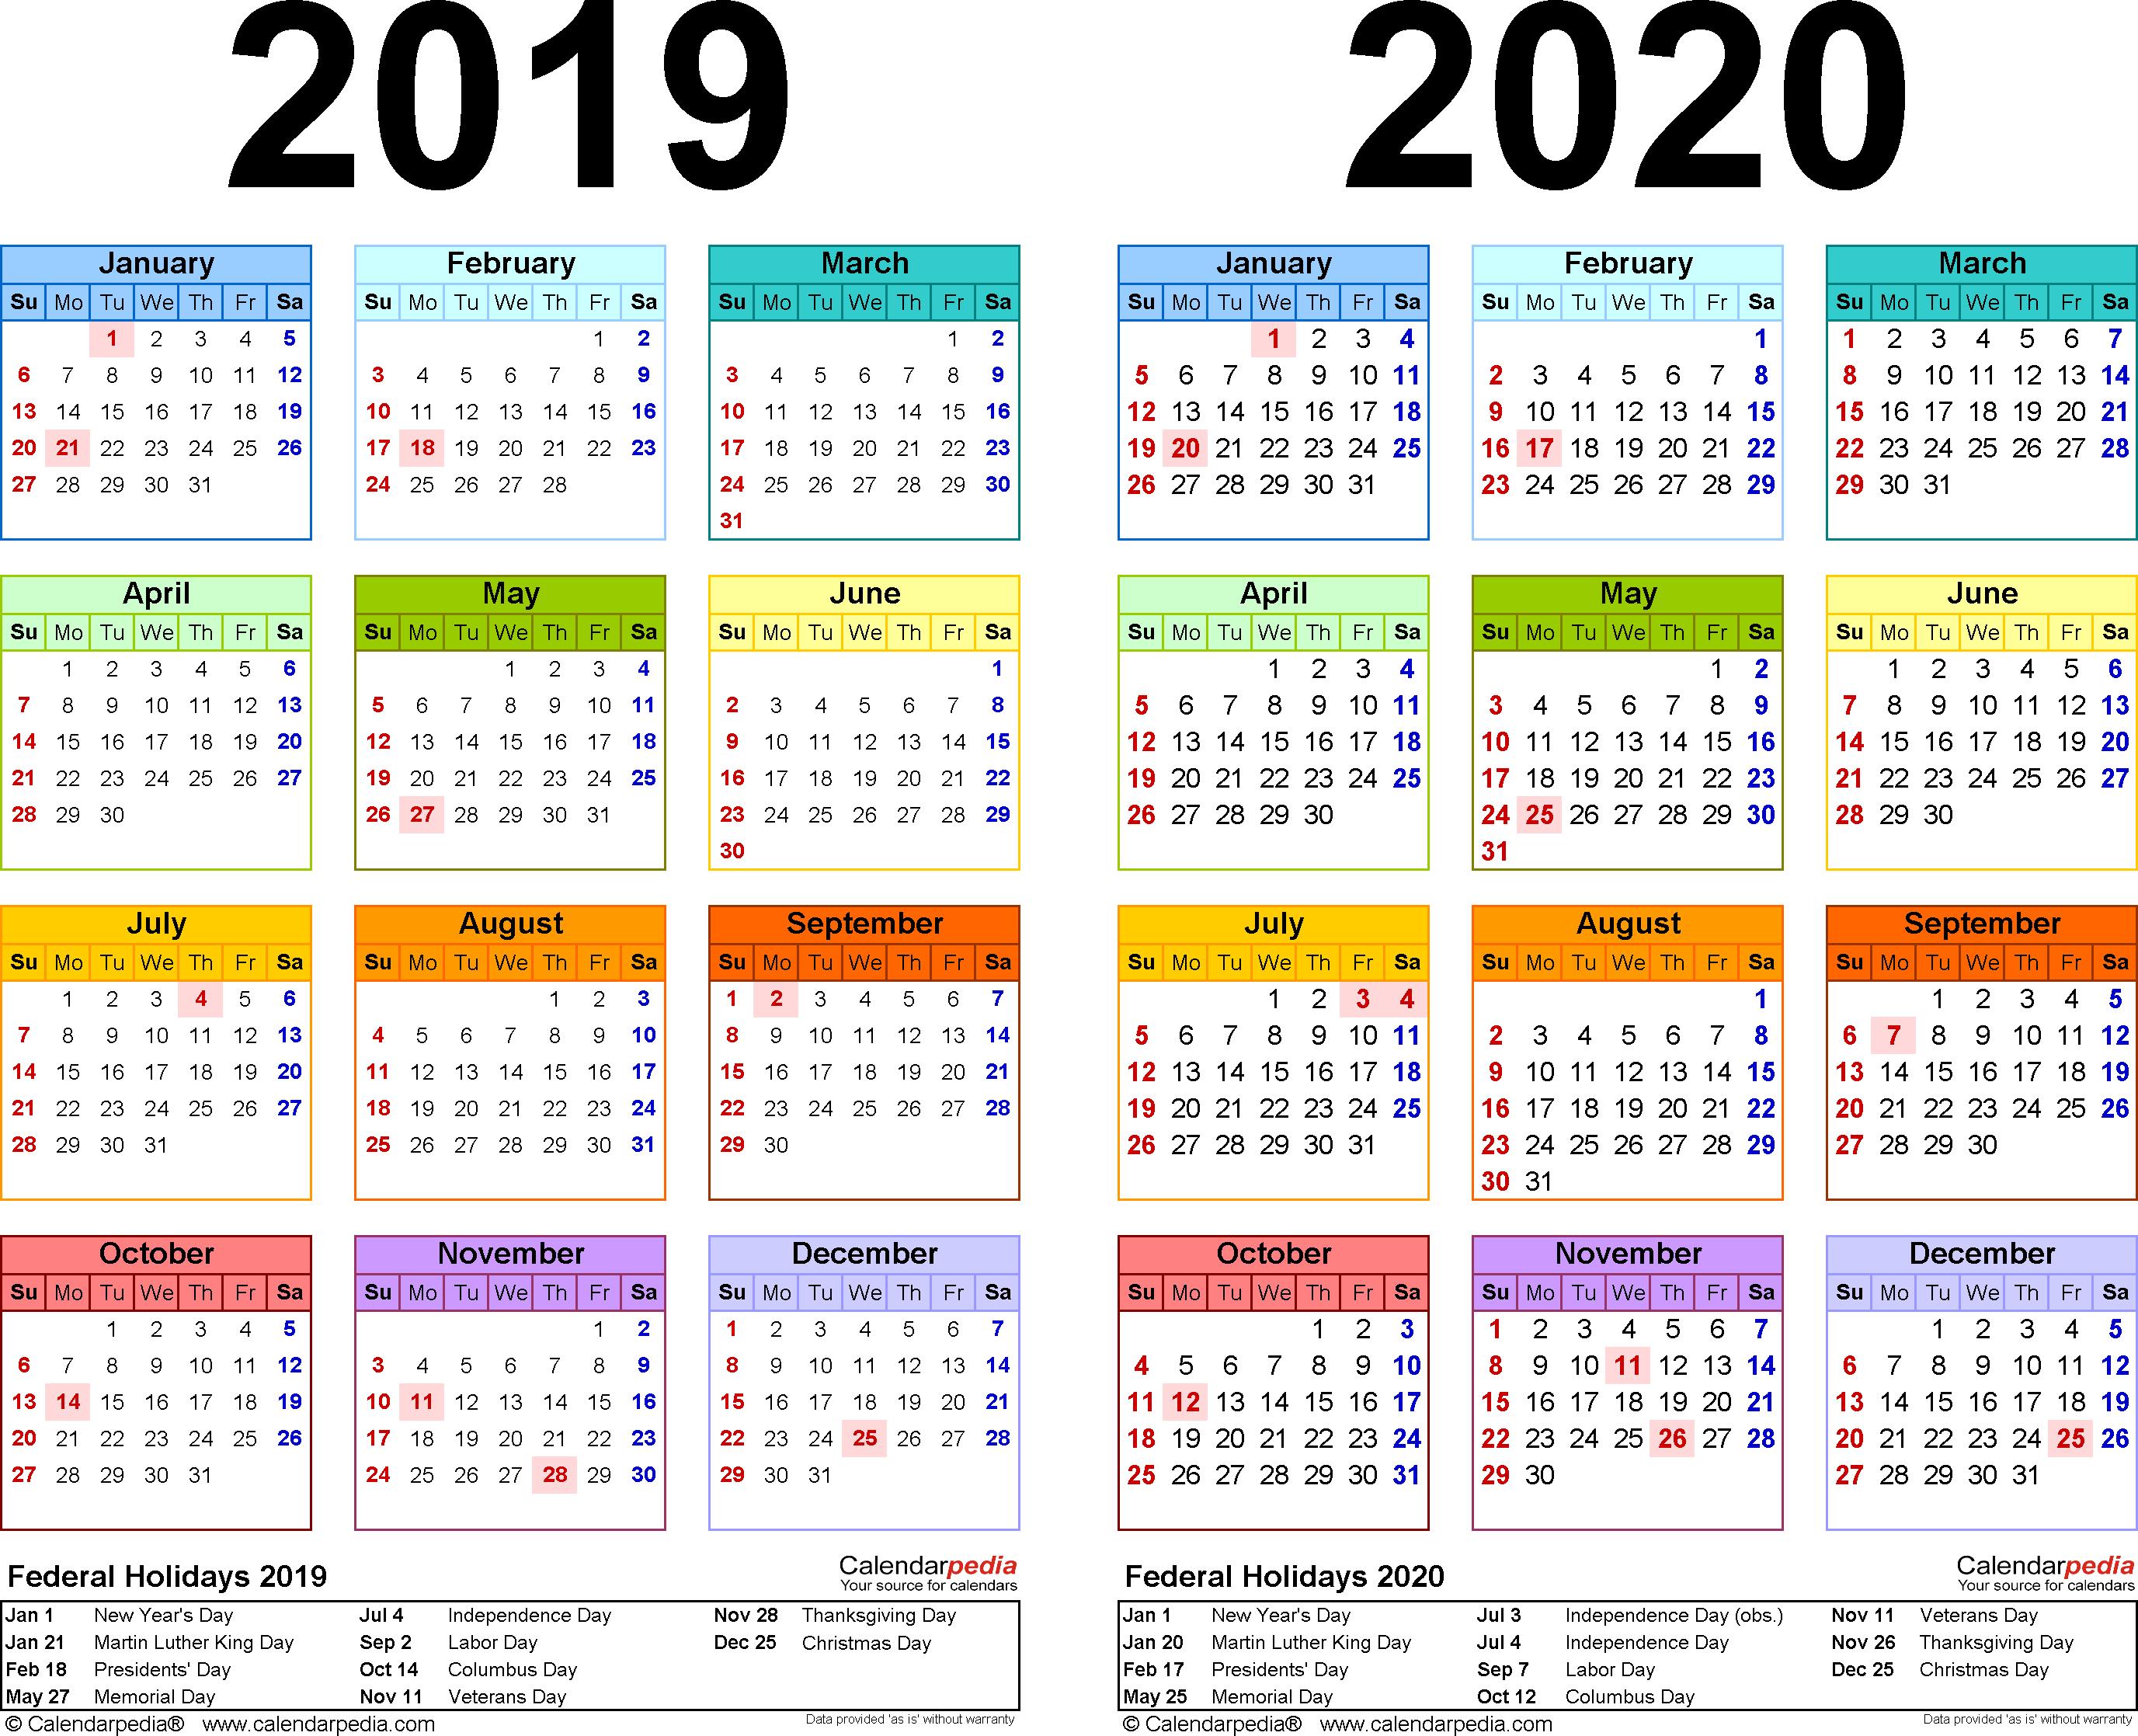 2019-2020 Calendar - Free Printable Two-Year Excel Calendars